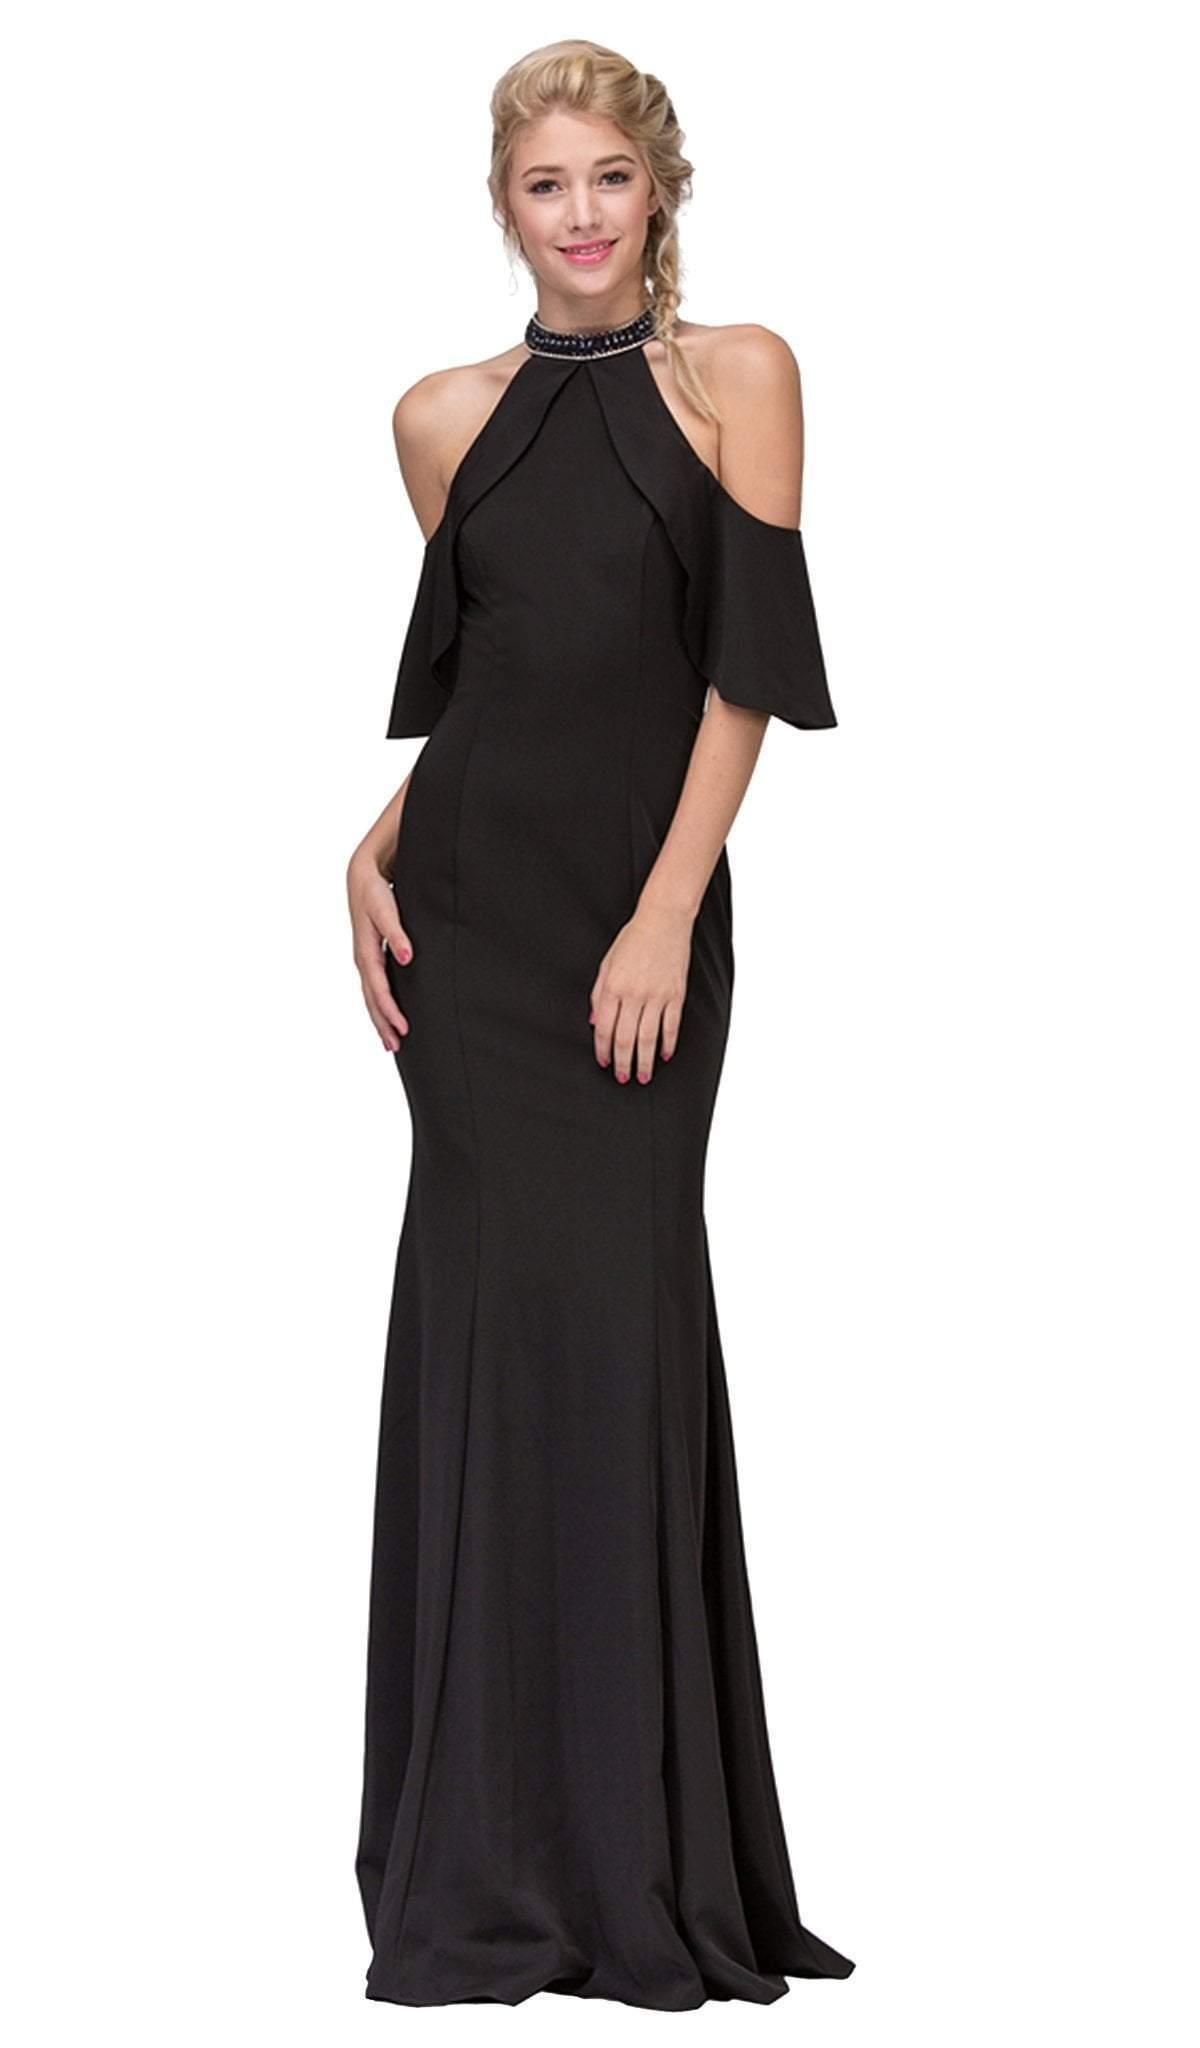 Eureka Fashion - Embellished High Halter Satin Sheath Evening Dress